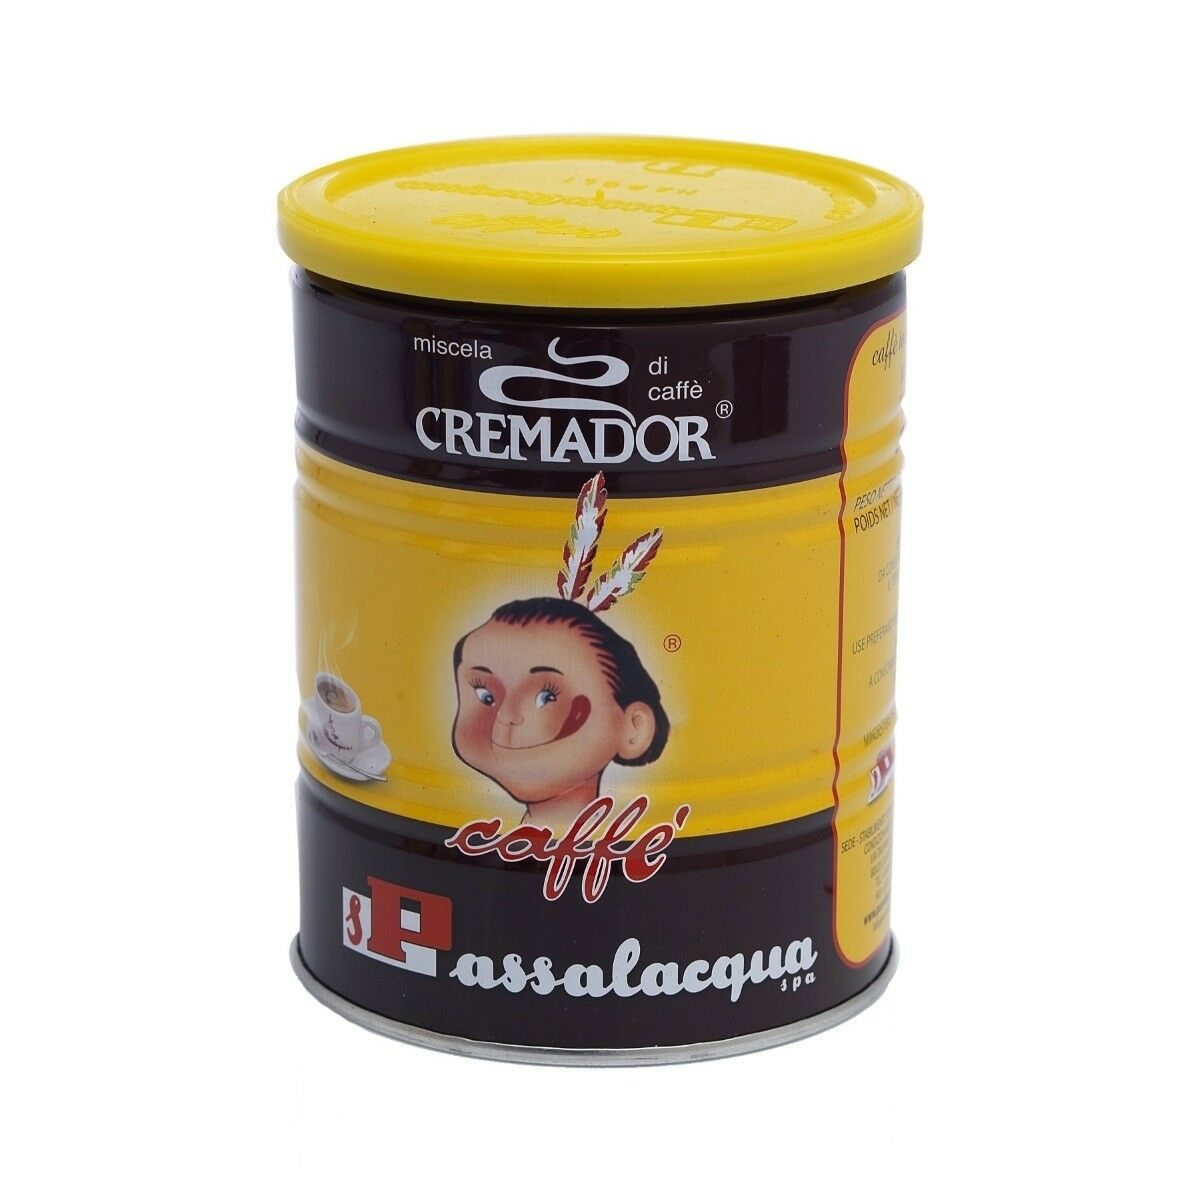 PASSALACQUA Cremador 12x 250 g gemahlen in Dosen